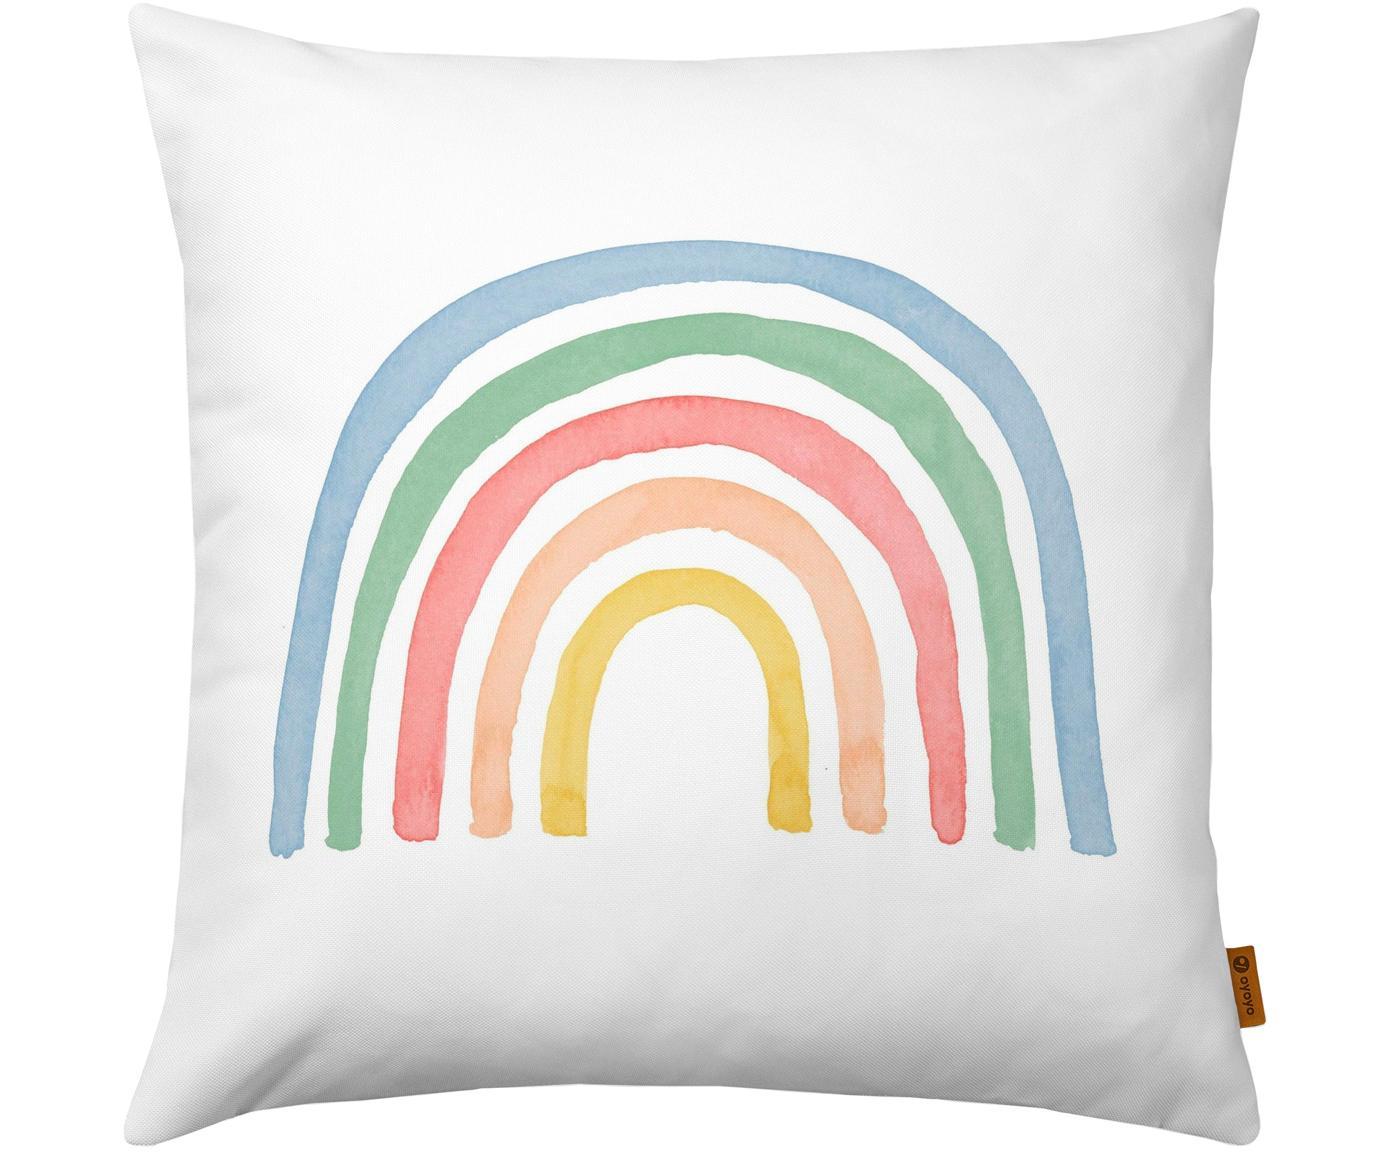 Funda de cojín Rainbow, Algodón, Blanco, multicolor, An 40 x L 40 cm